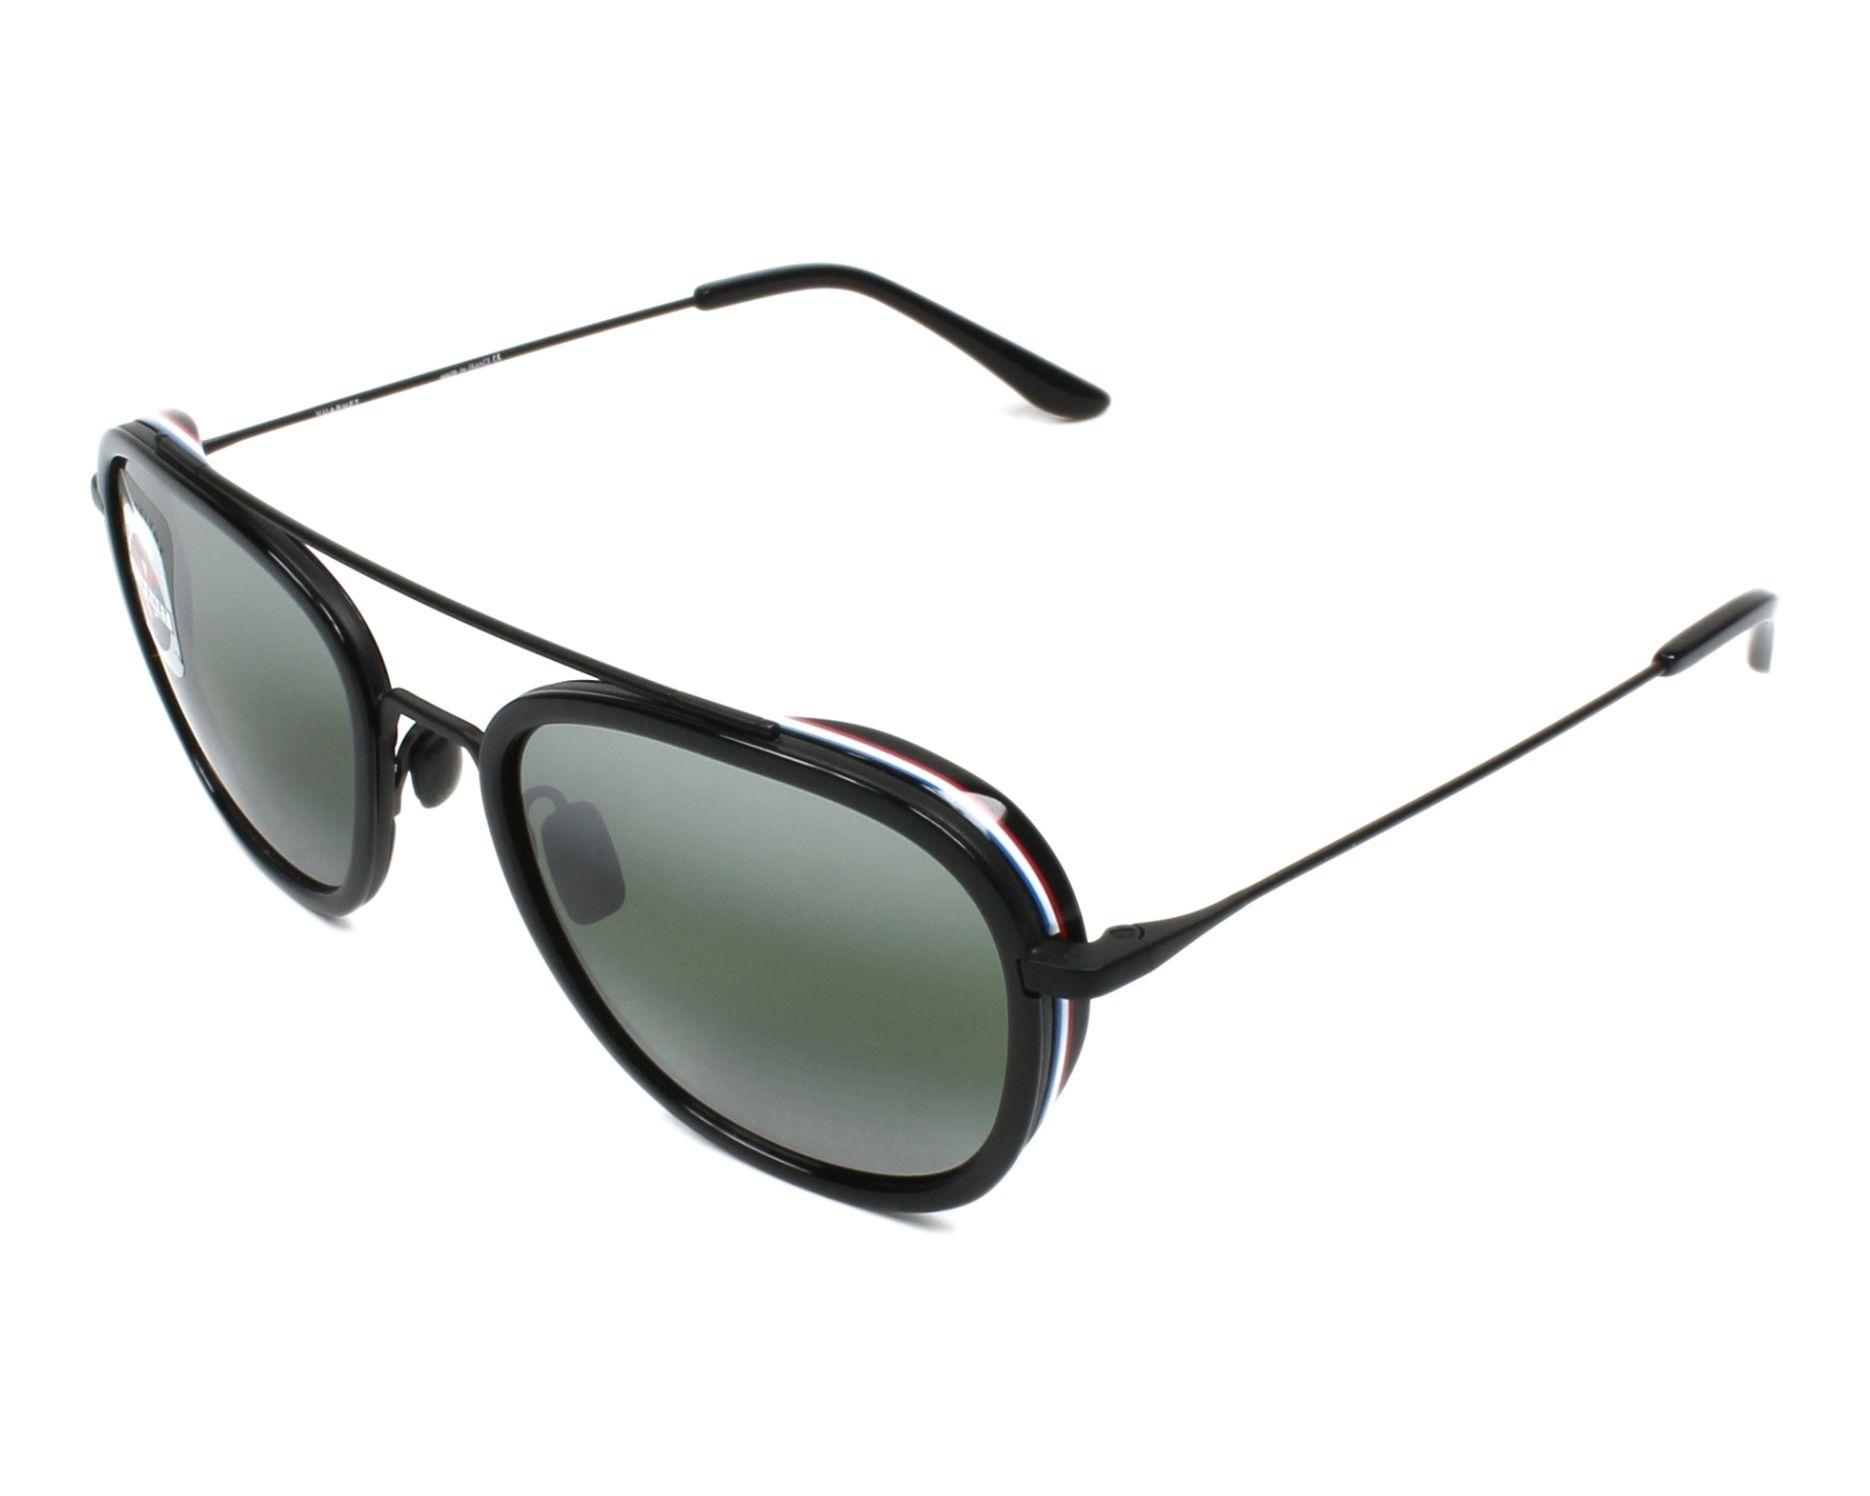 Sunglasses Vuarnet VL-1615 0007-1136 54-19 Black Black profile view 40901f6f02f8